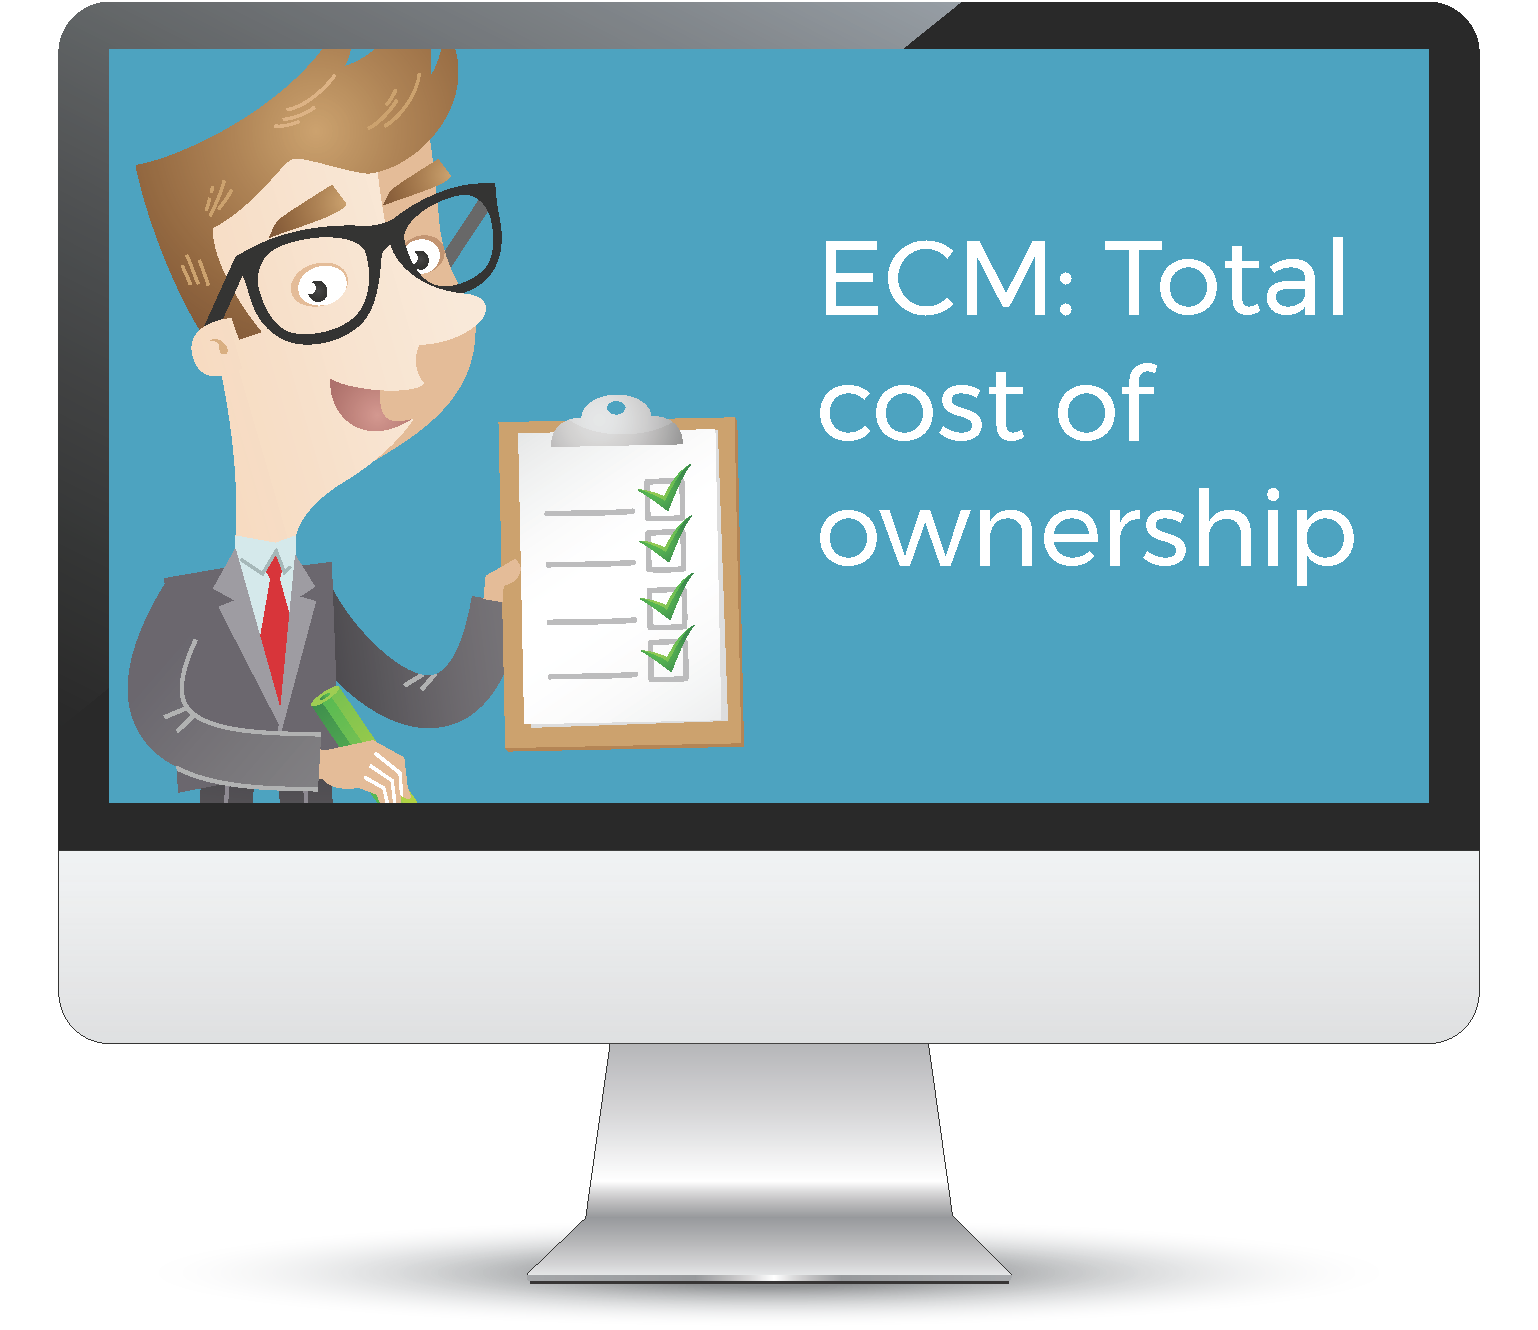 ECM Costs